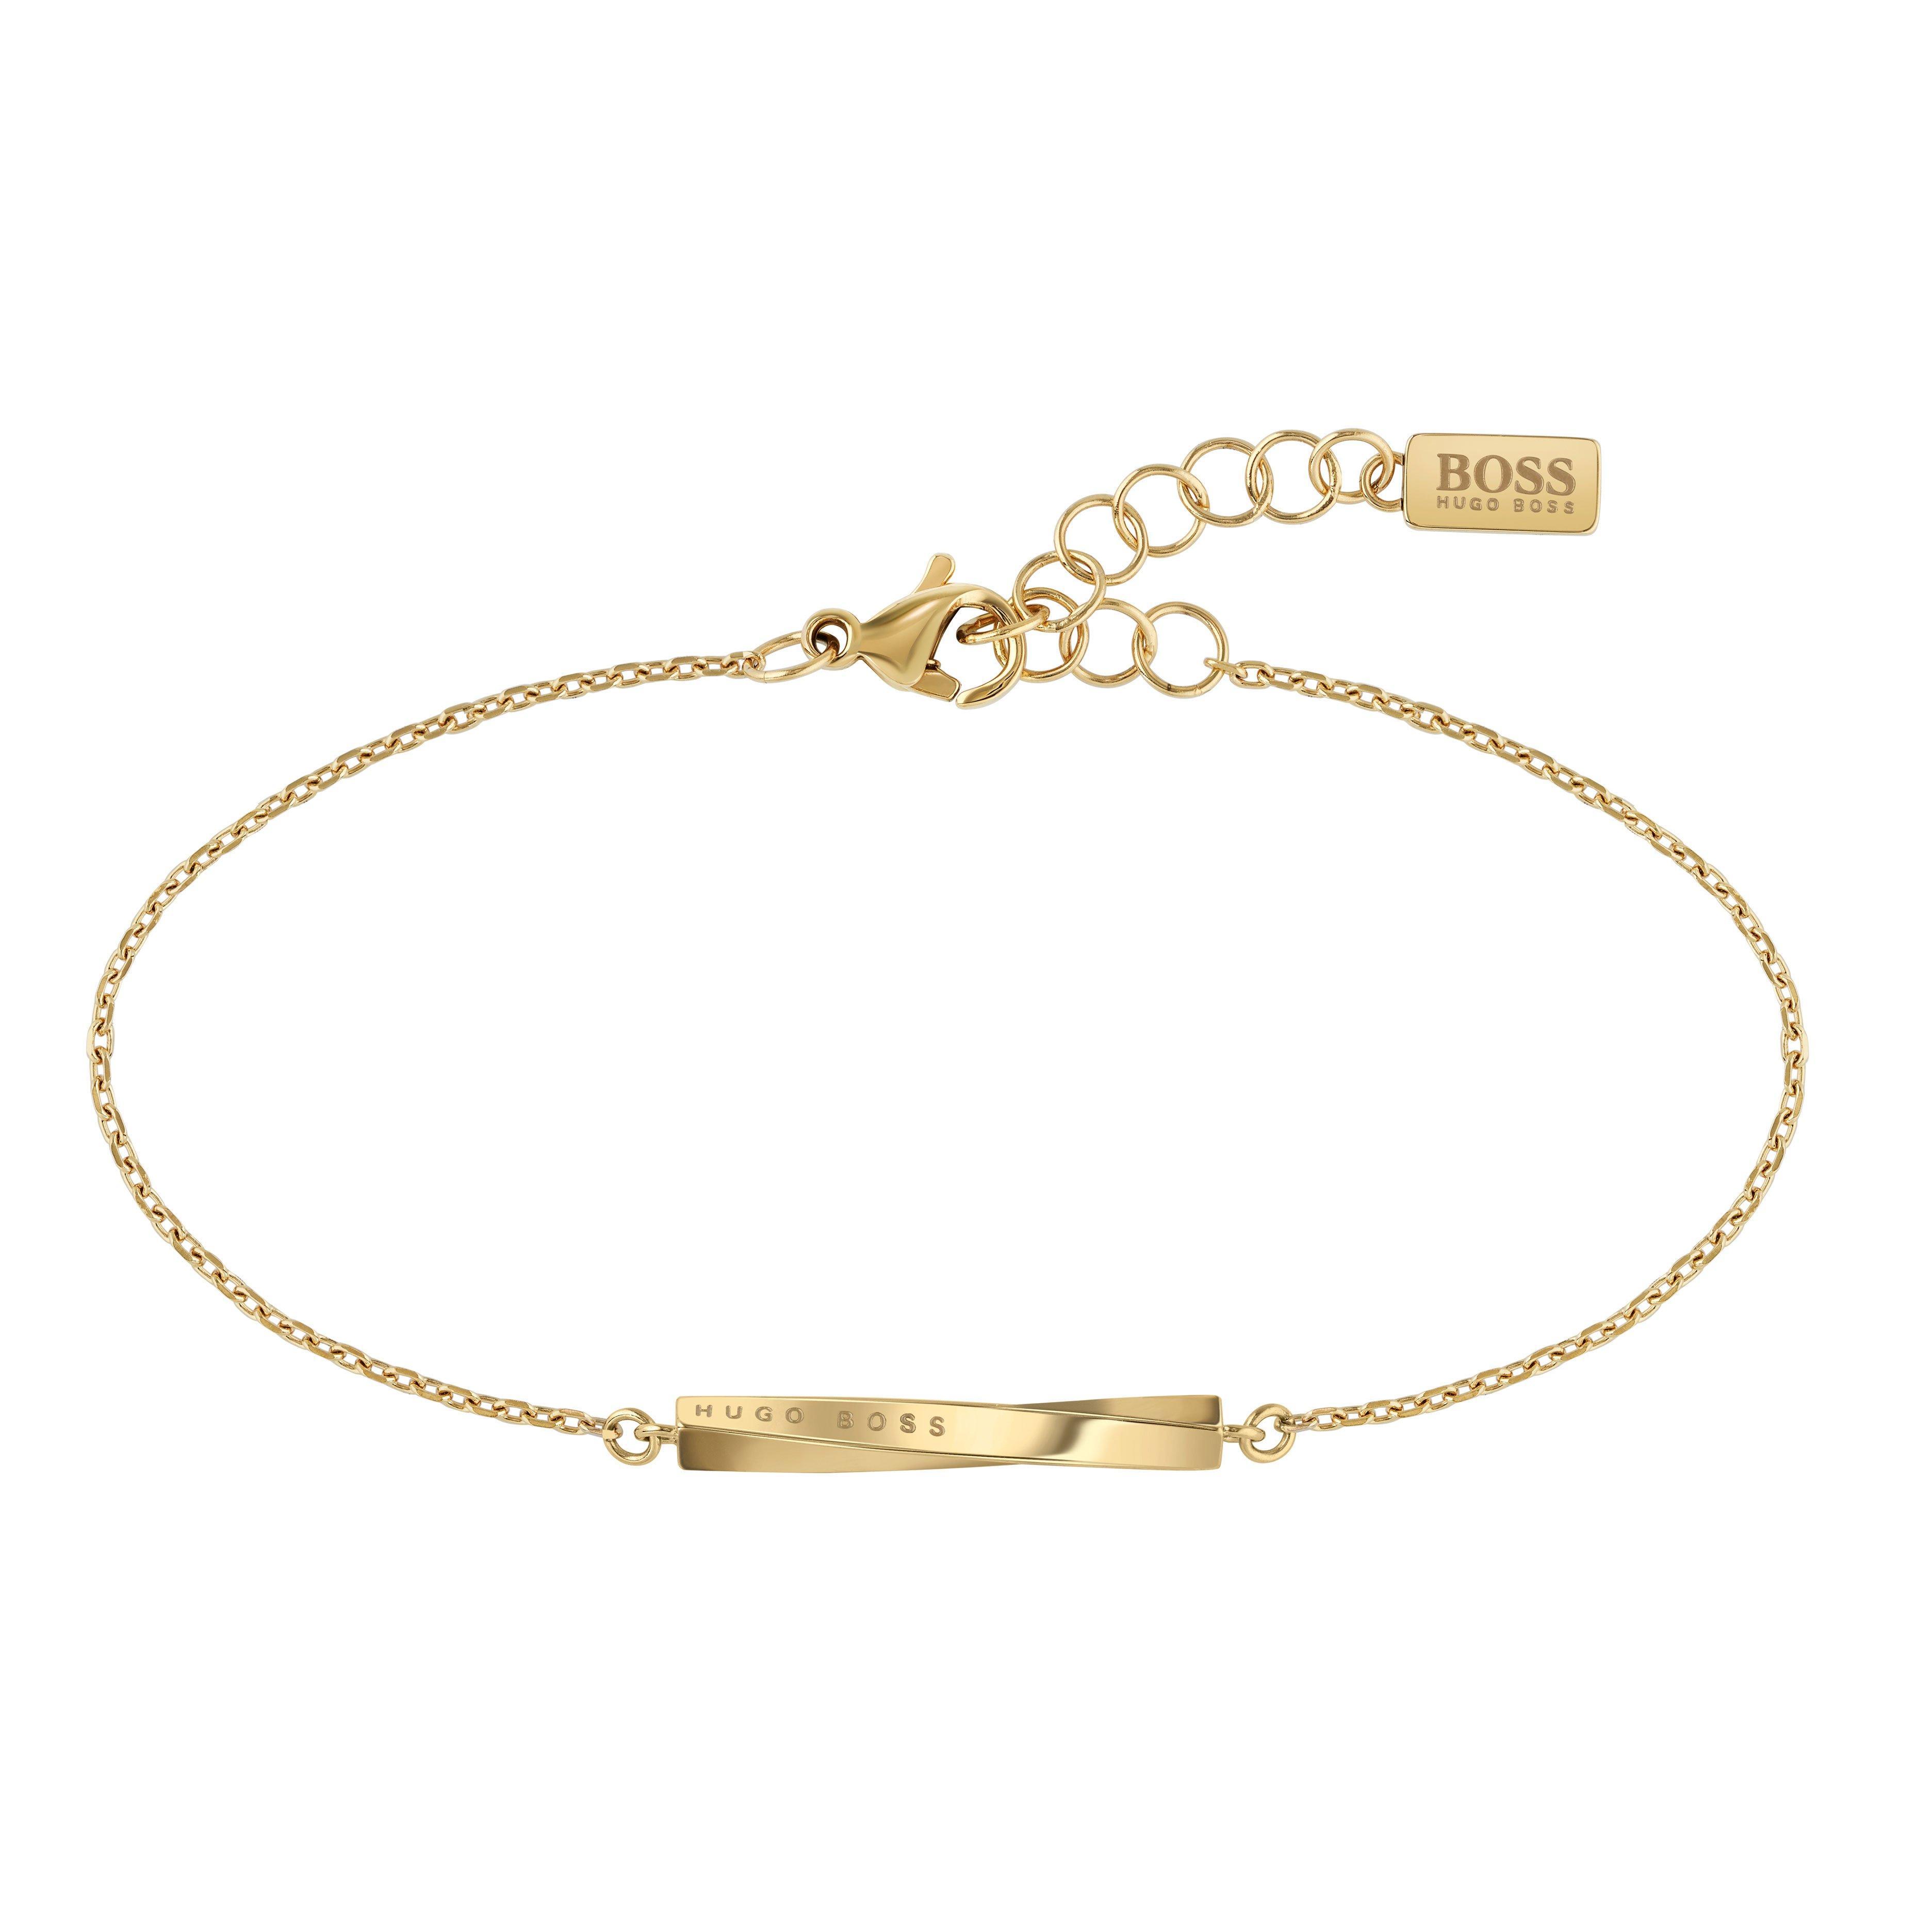 BOSS Signature Gold Tone Bracelet